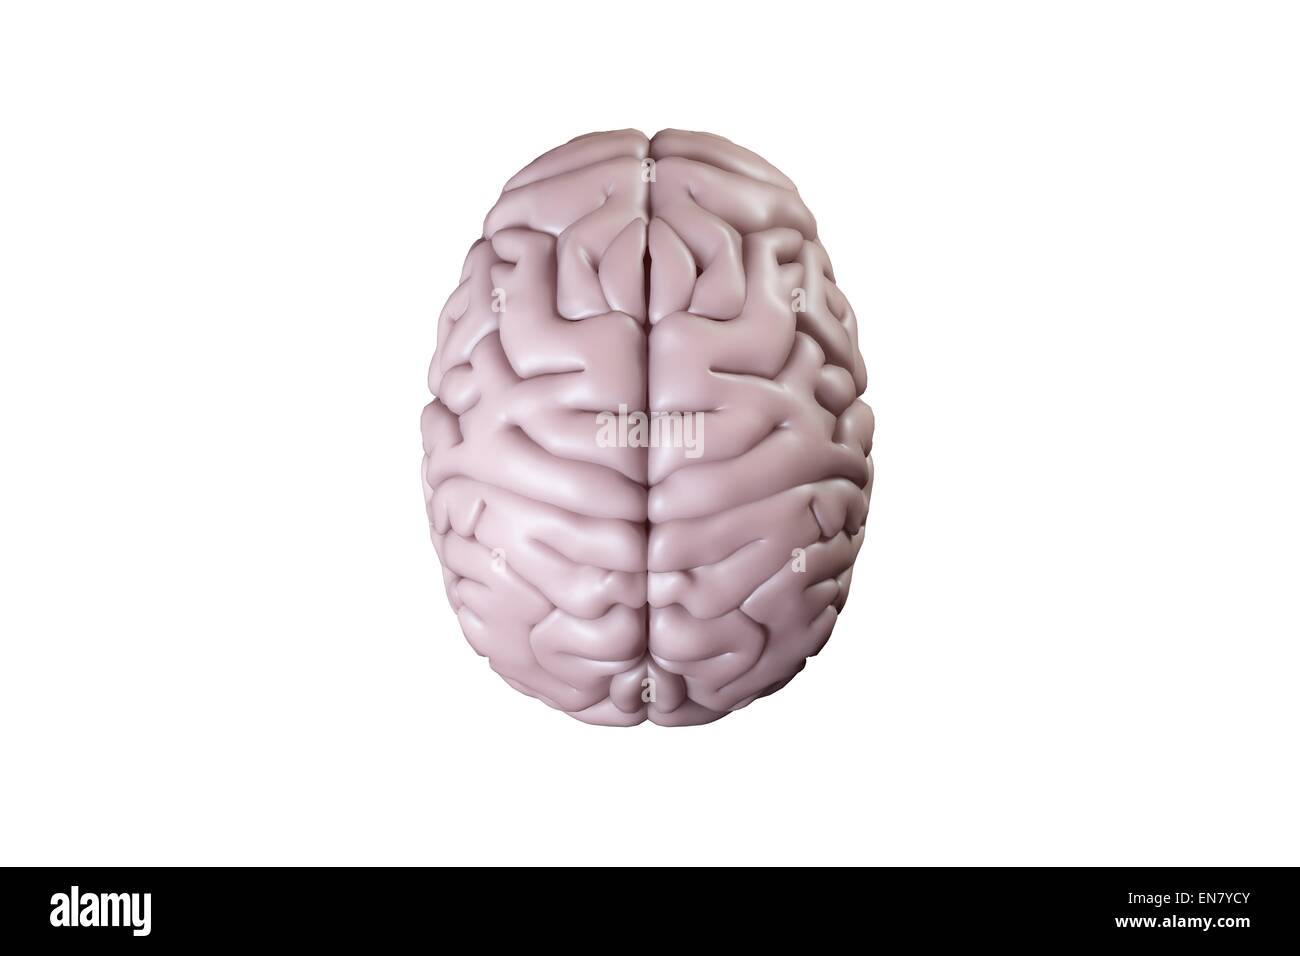 Digitally generated brain - Stock Image